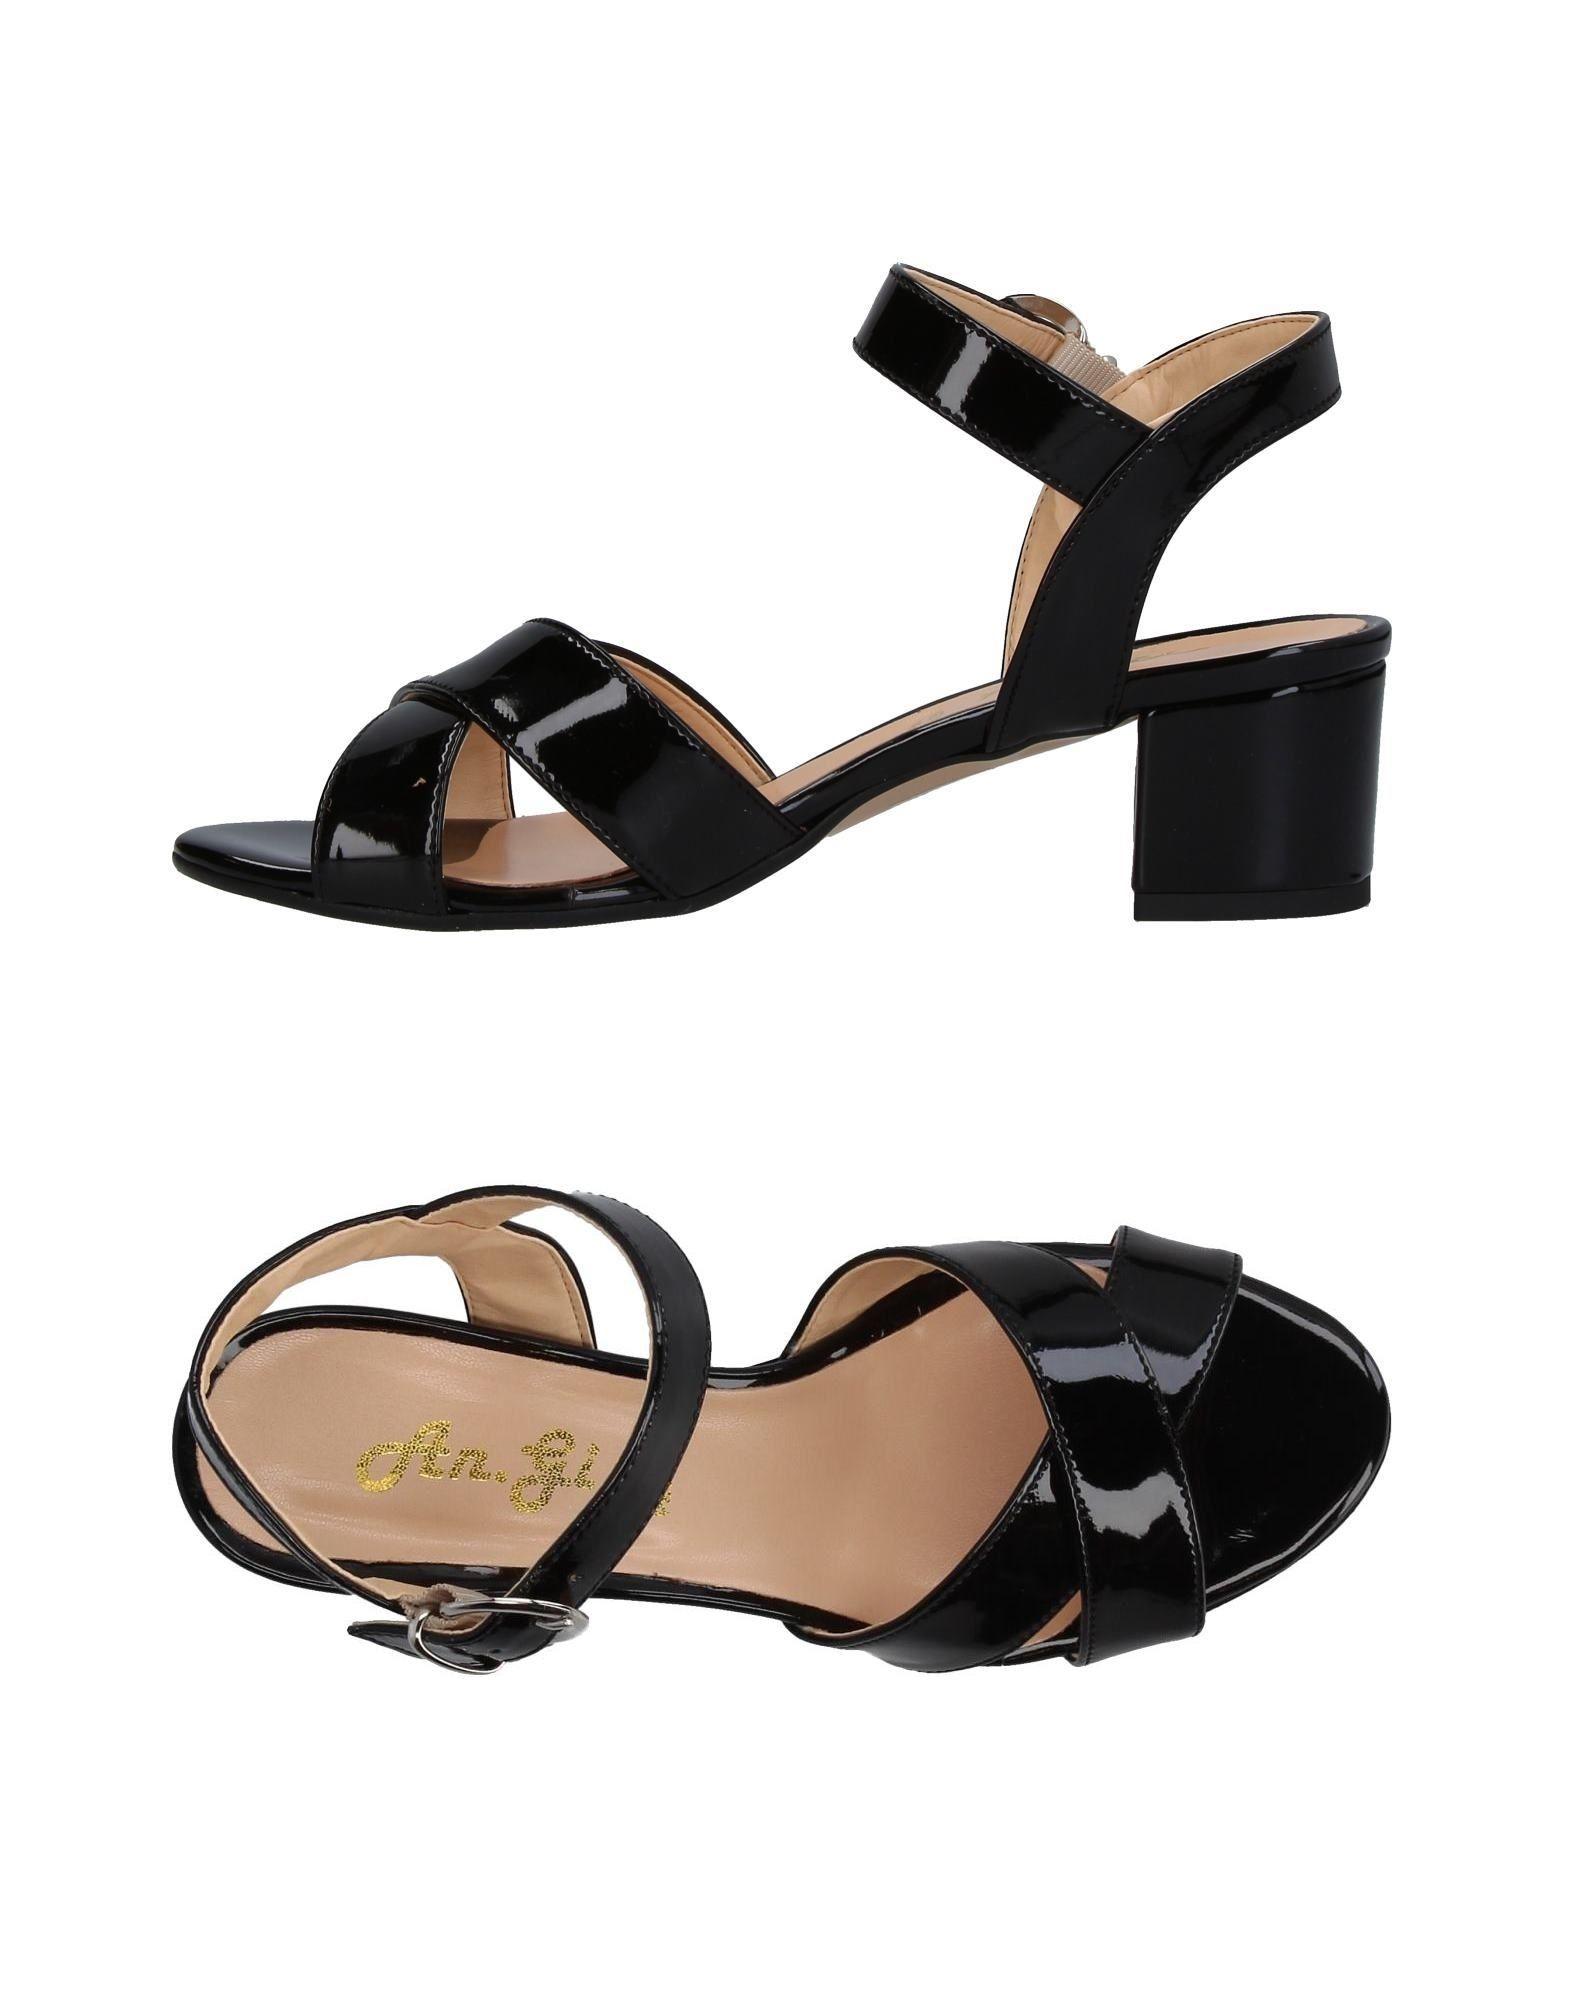 Sandales An.Gi Femme - Sandales An.Gi sur